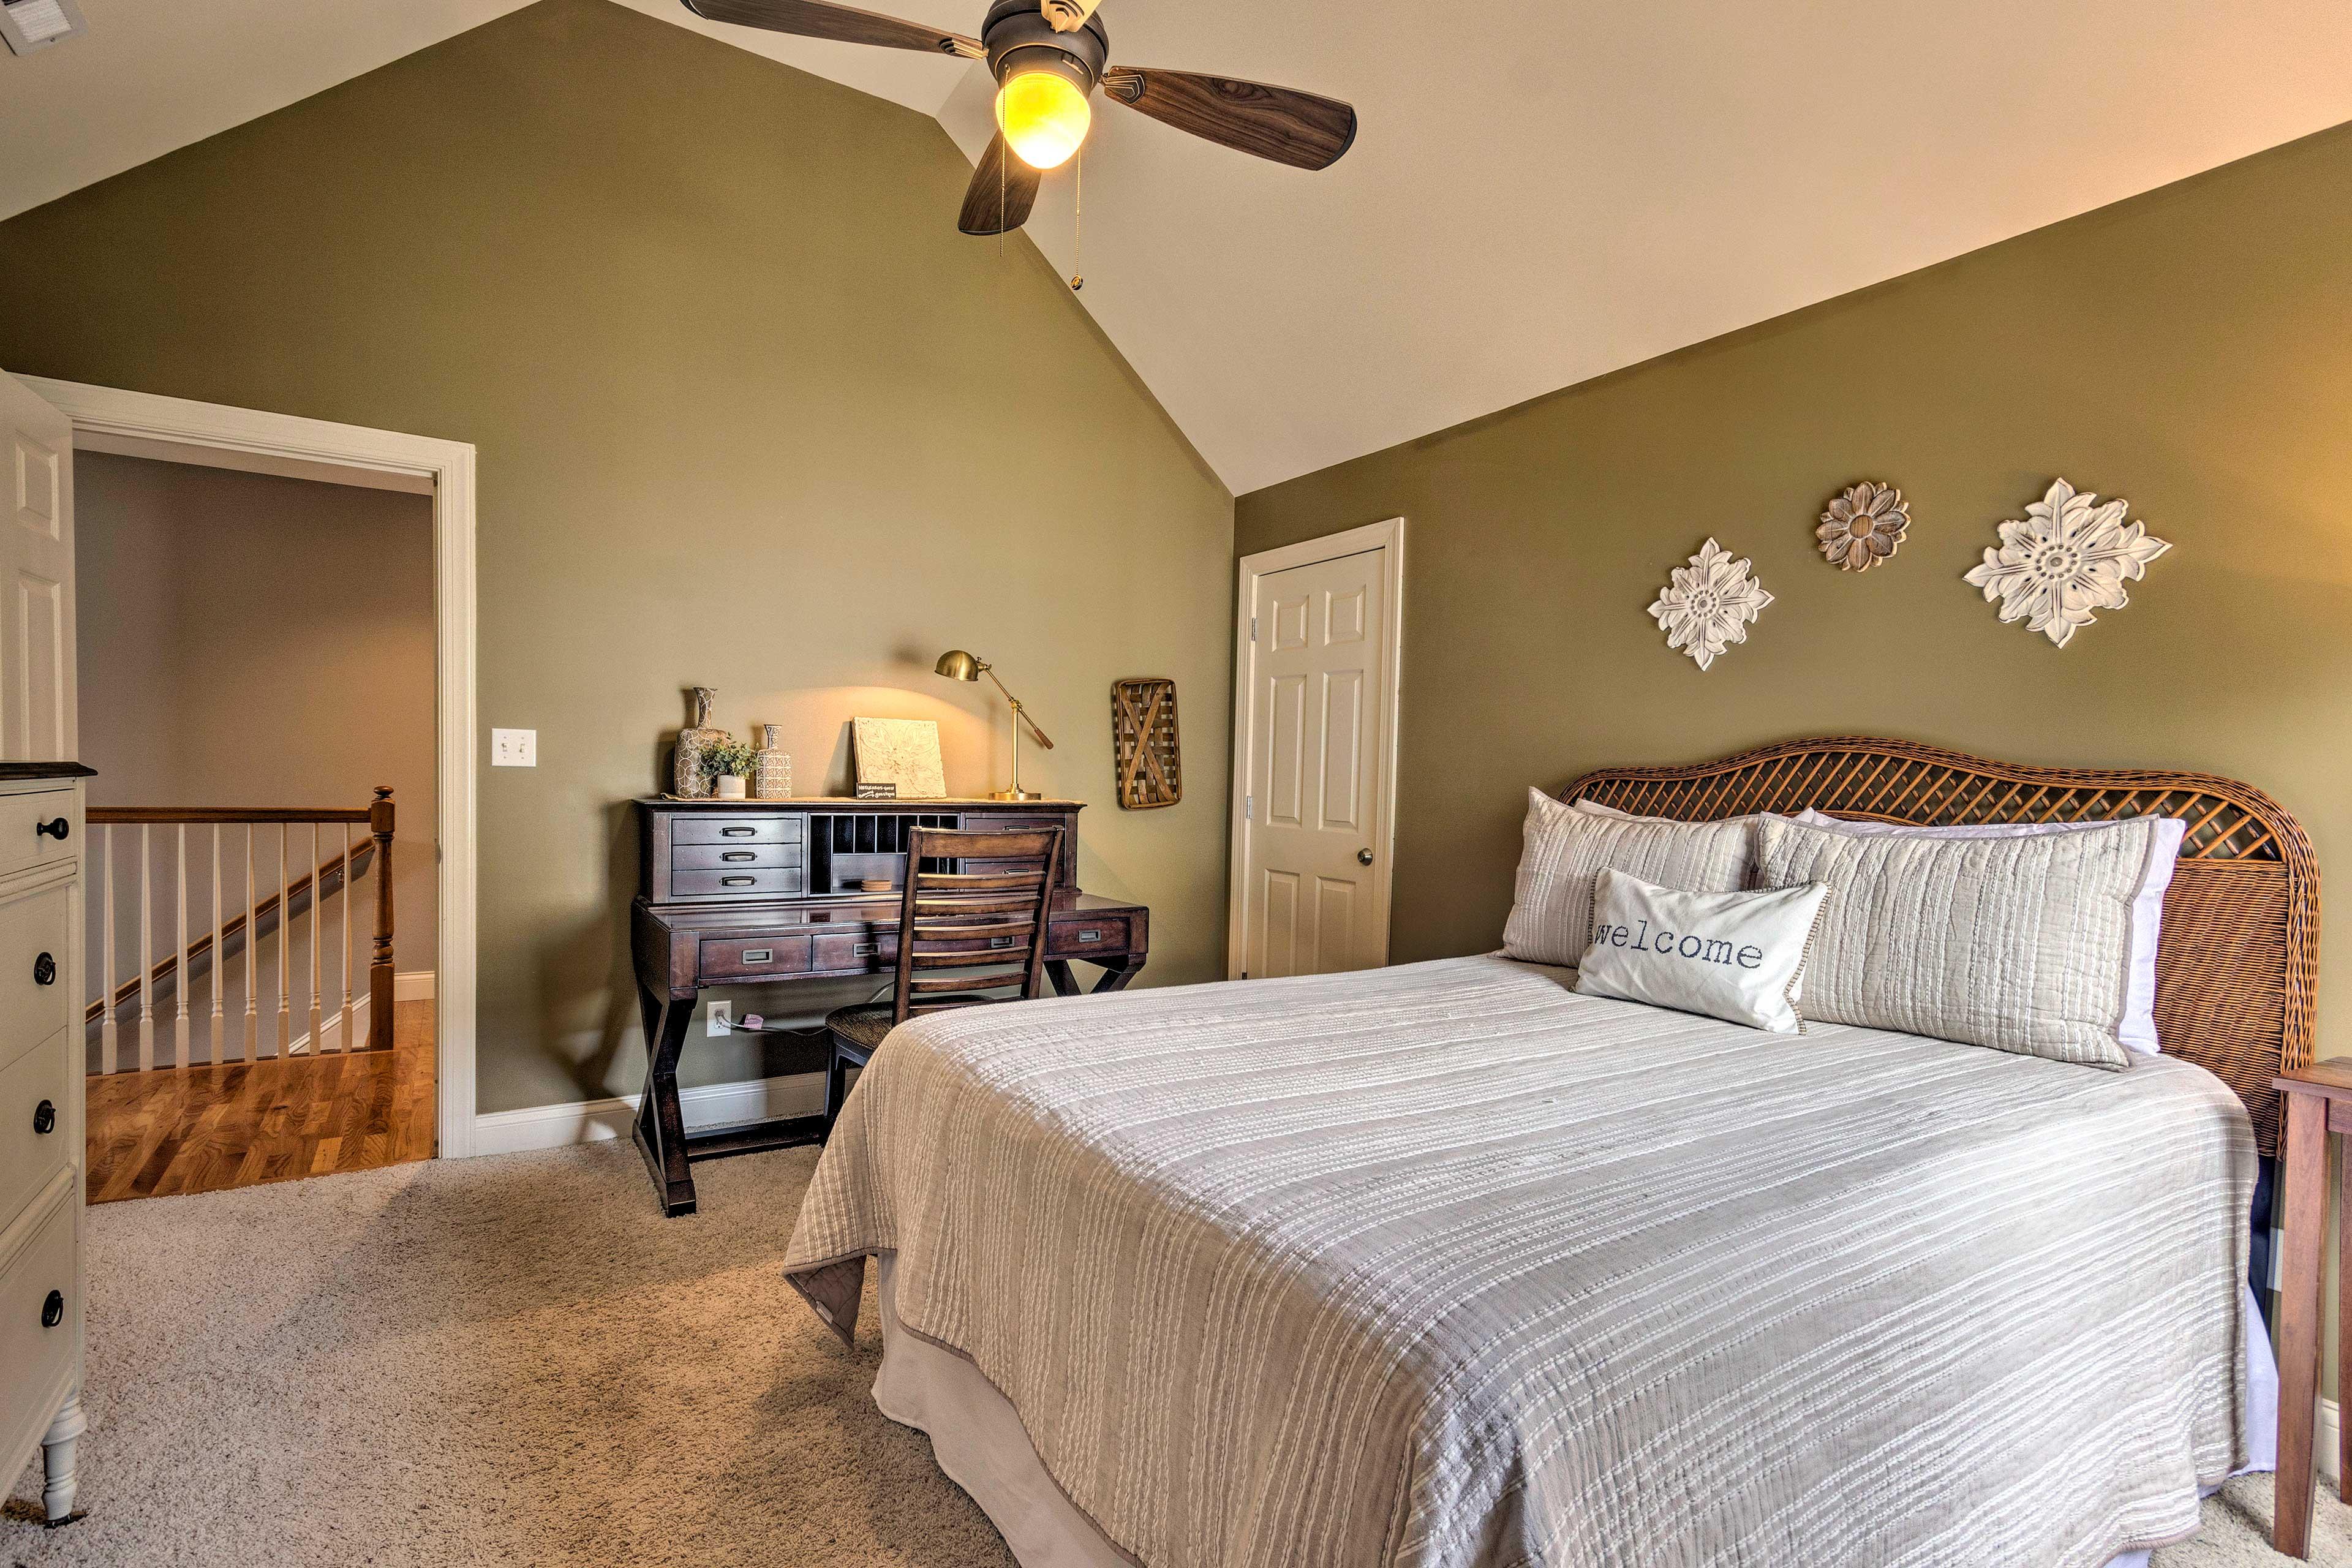 The third bedroom now has a queen bed.